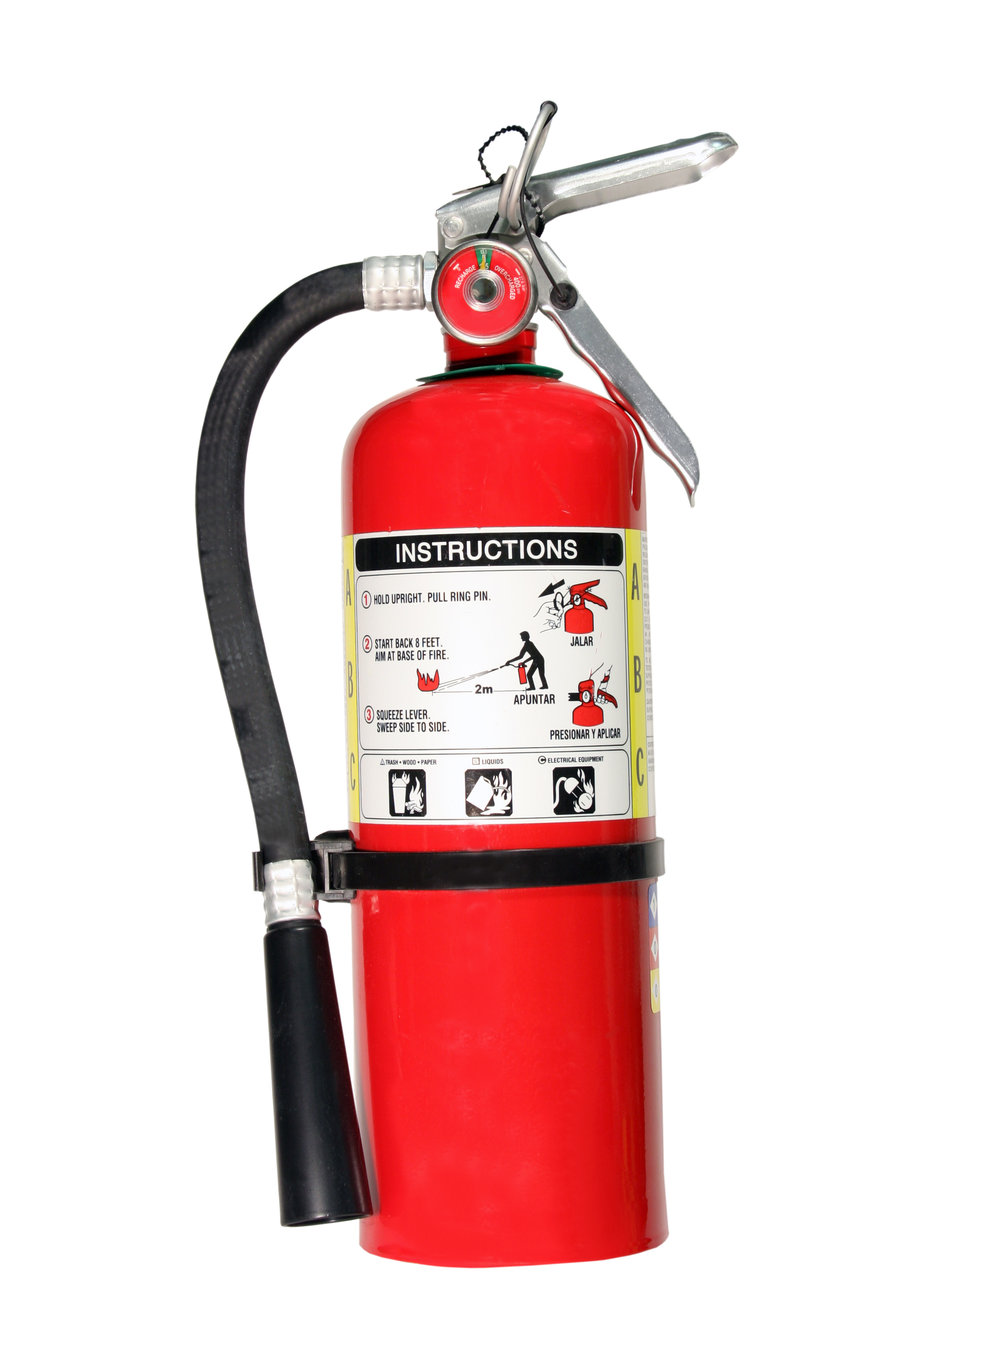 shutterstock_Extinguisher.jpg